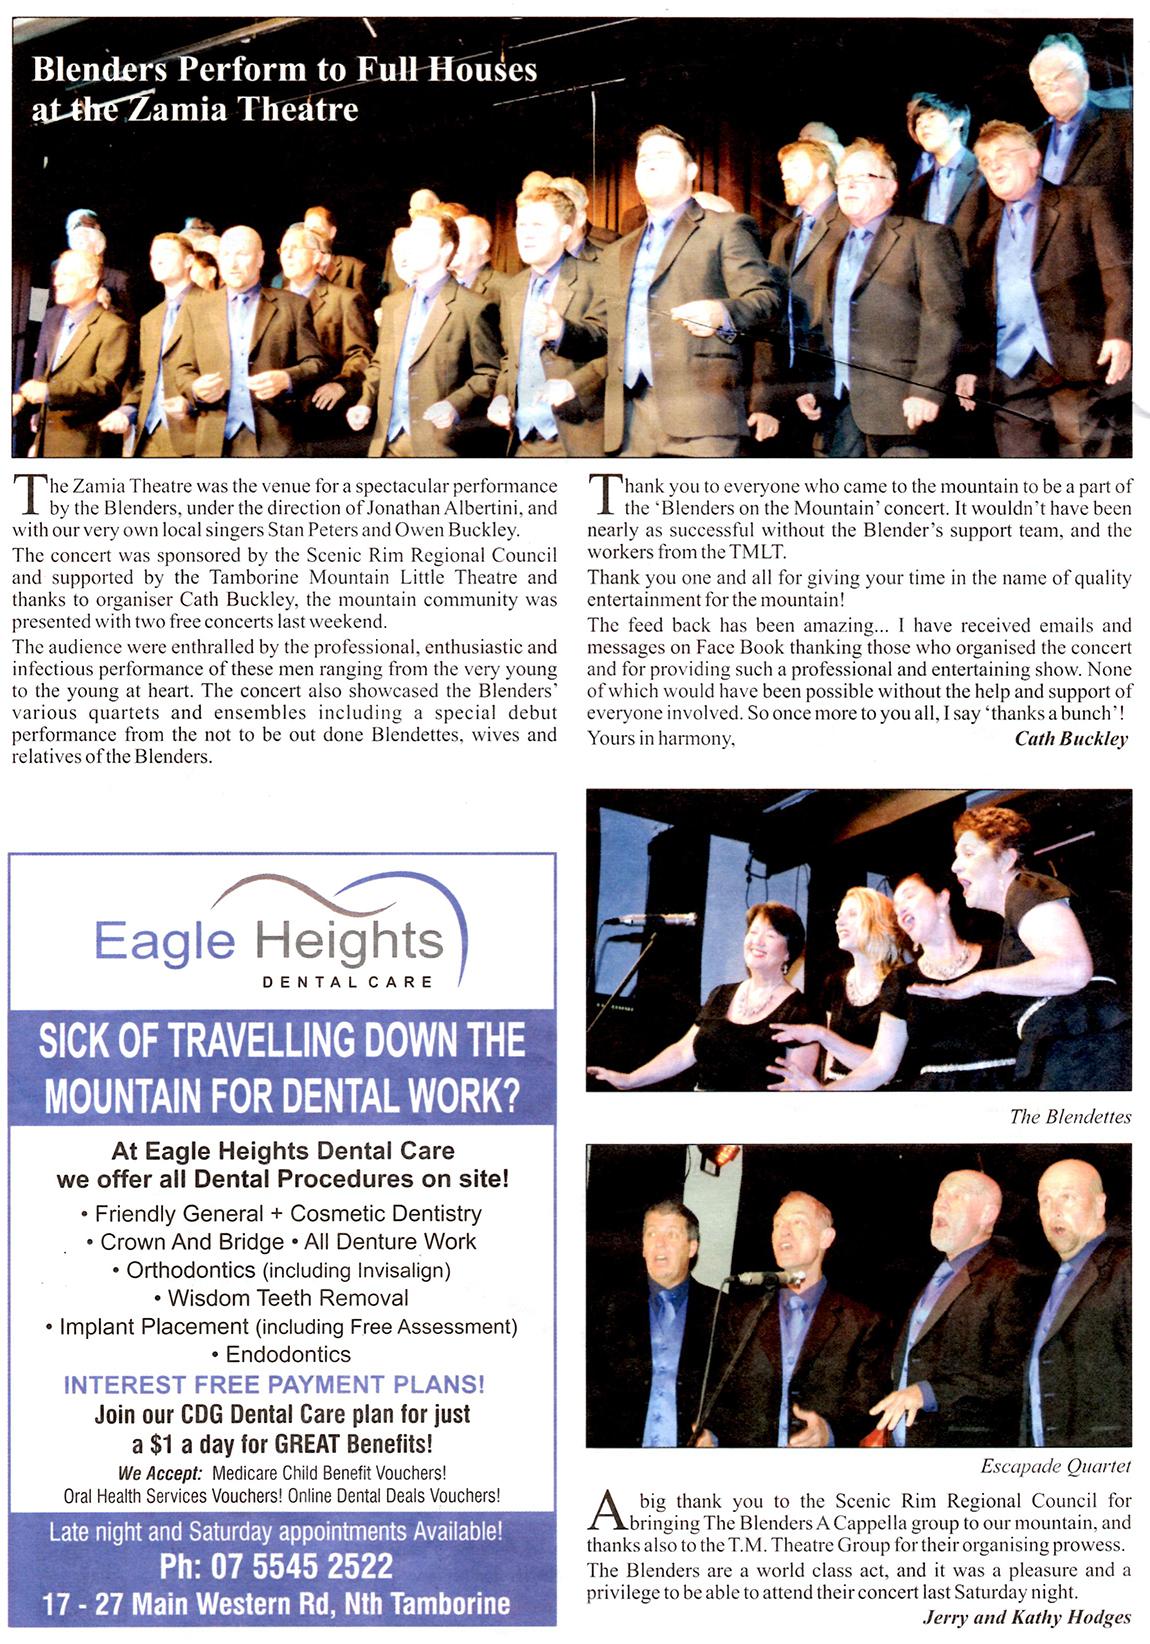 Blenders concert at the Zamia - Tamborine Times, 30/7/15